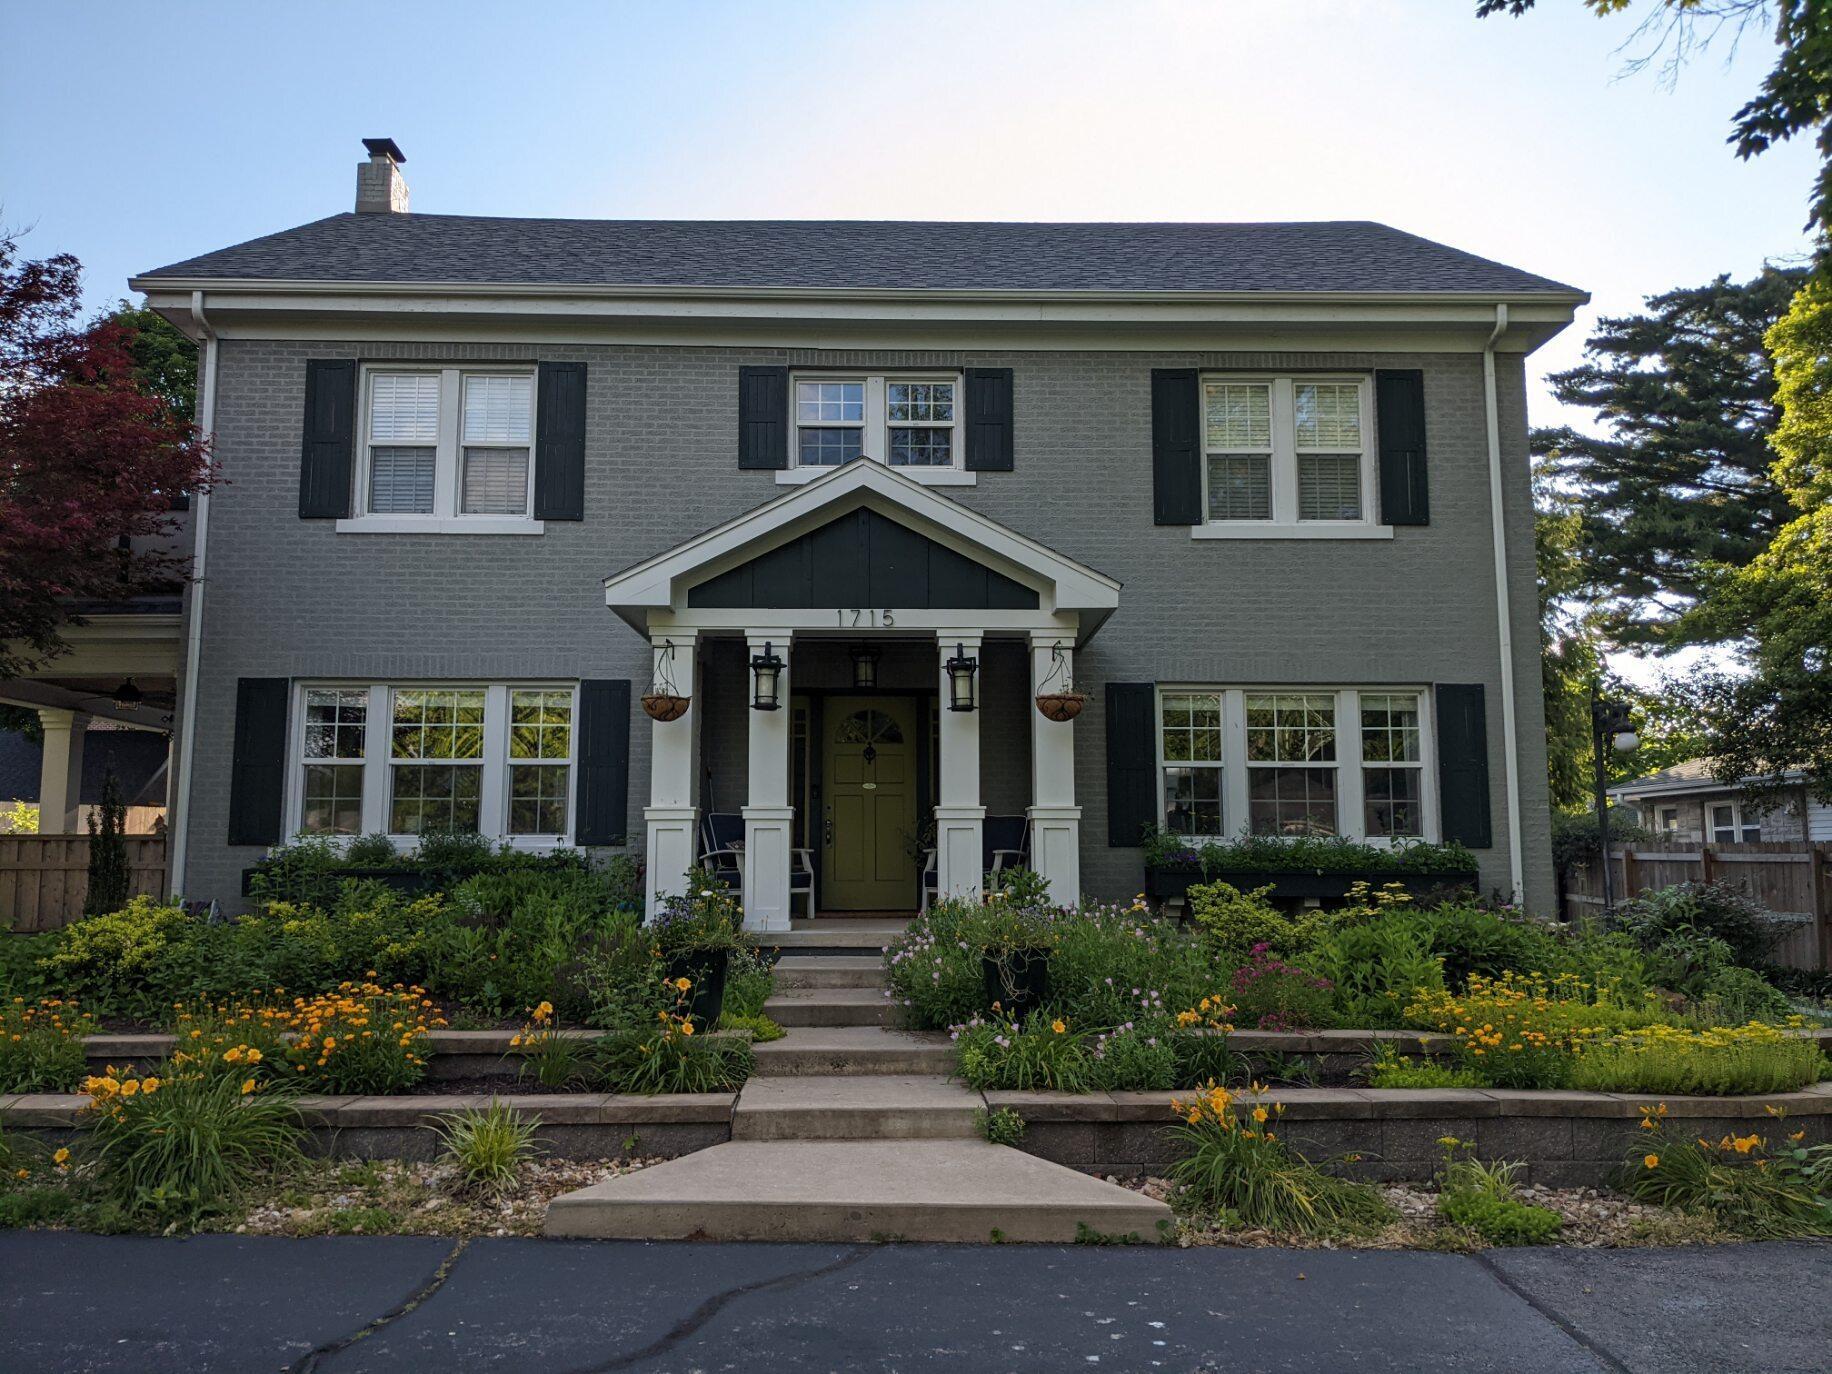 1715 South National Avenue Springfield, MO 65804